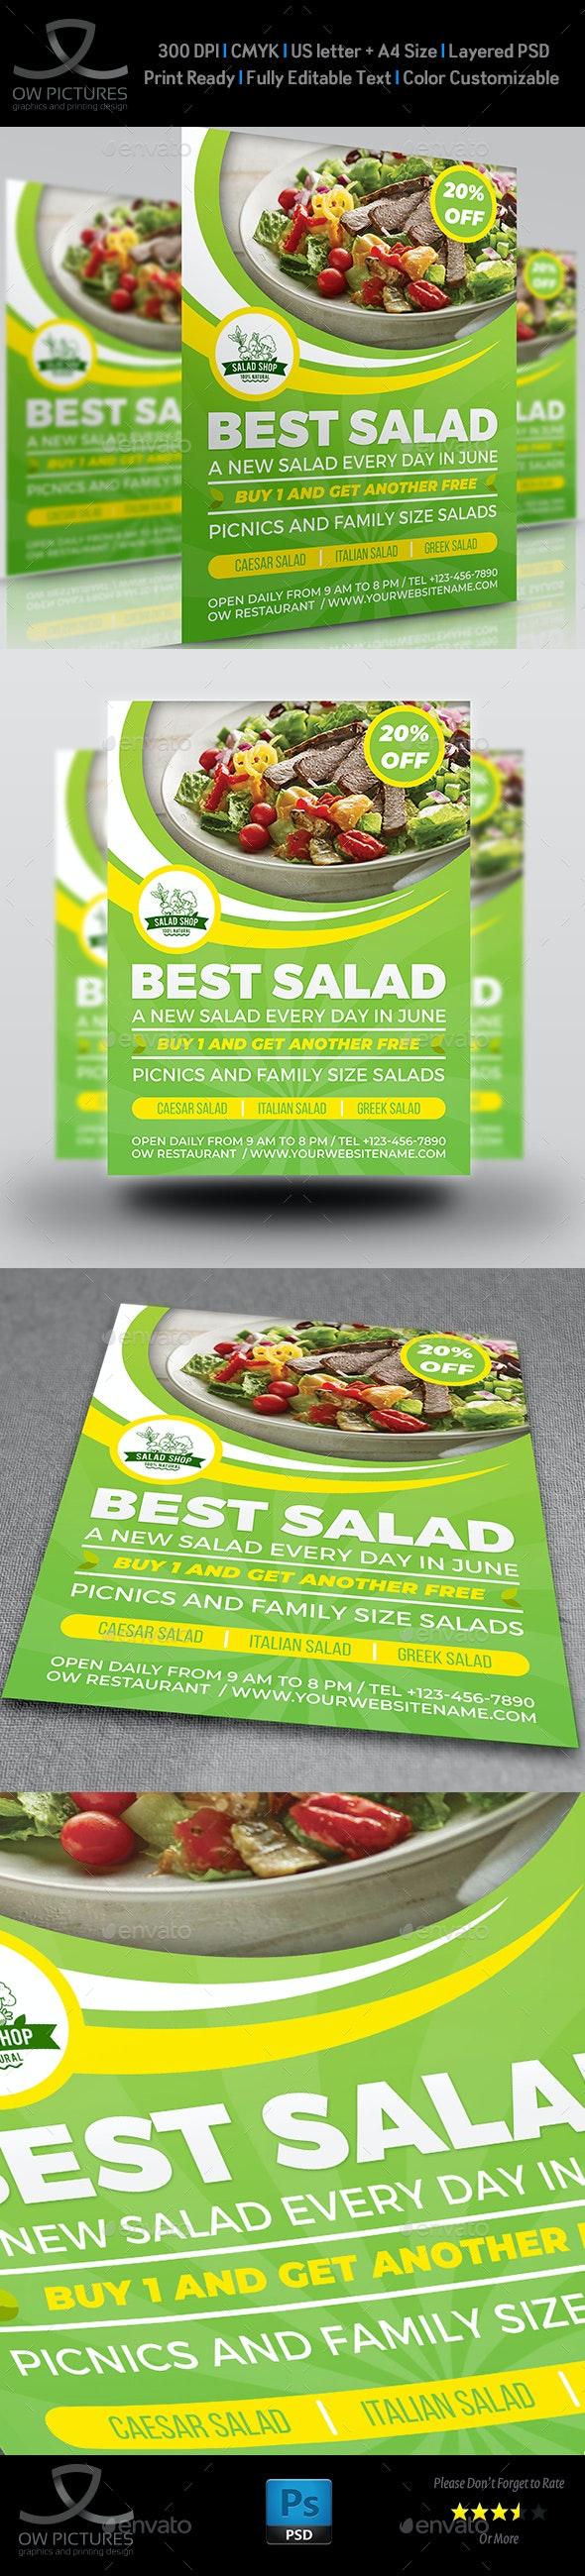 Salad Restaurant Flyer Template Vol.2 - Restaurant Flyers